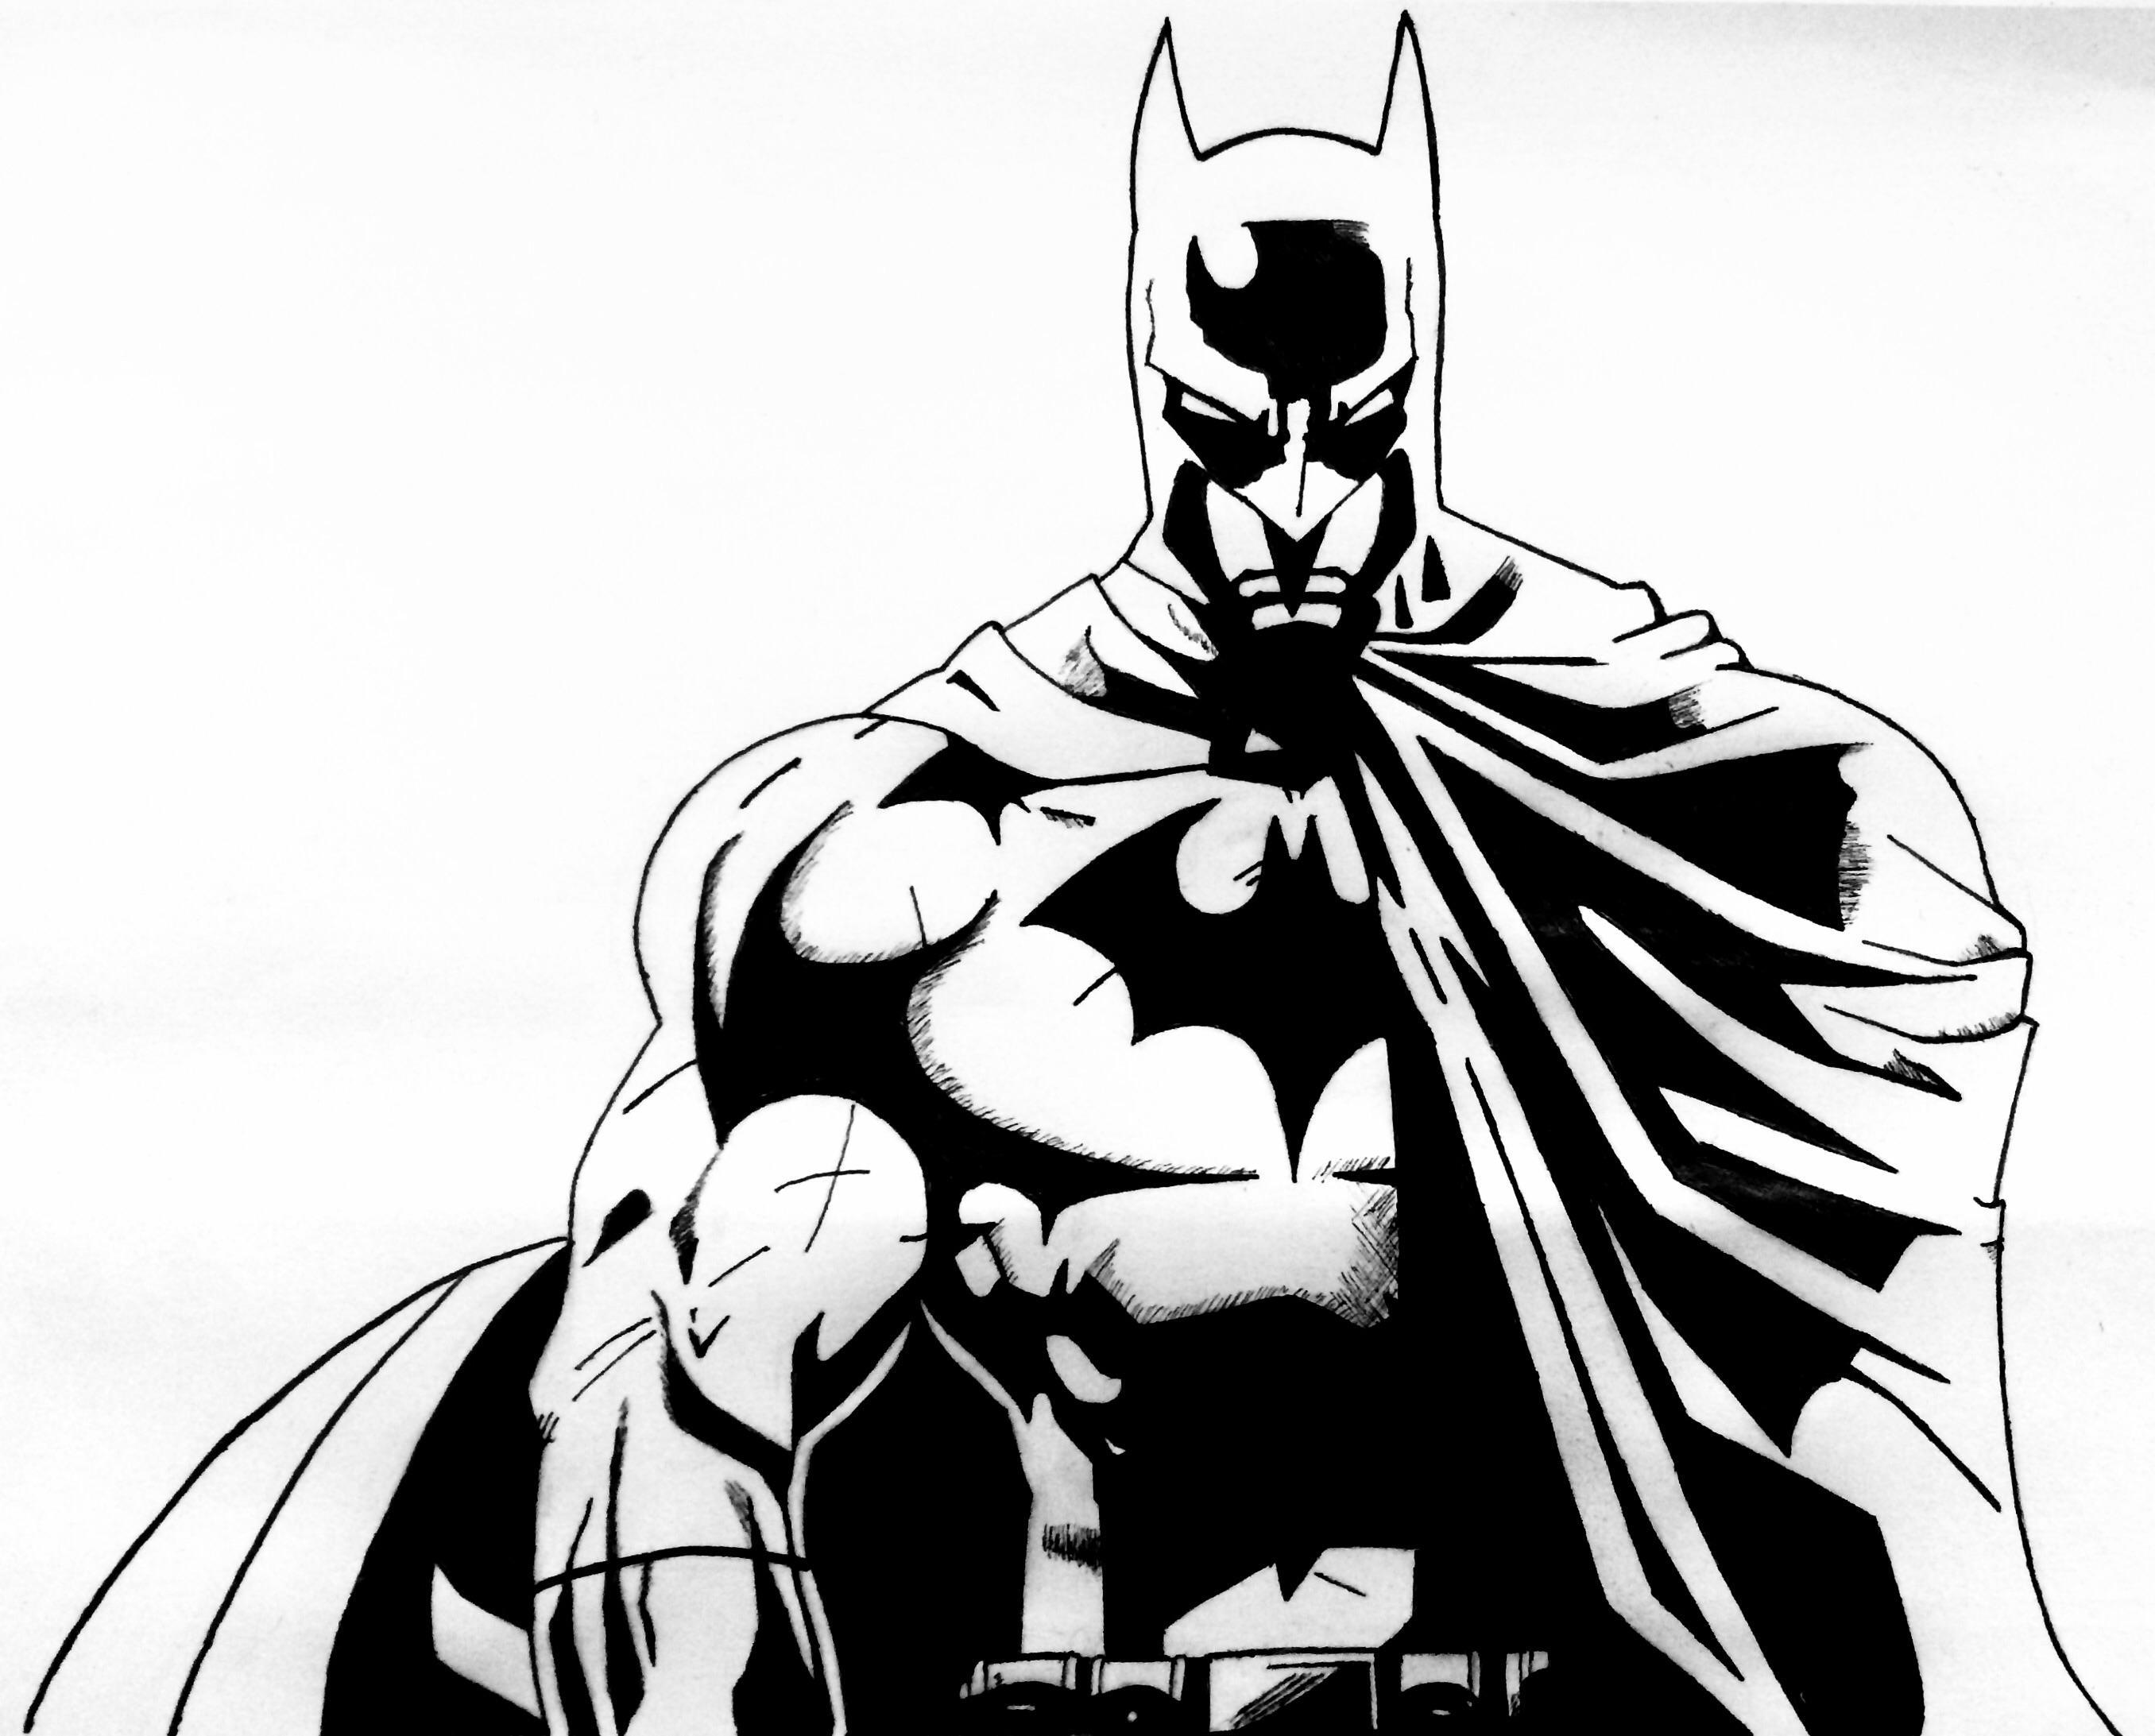 2712x2185 Batman Ink A4 Httpift.tt2fiil3x Art A4